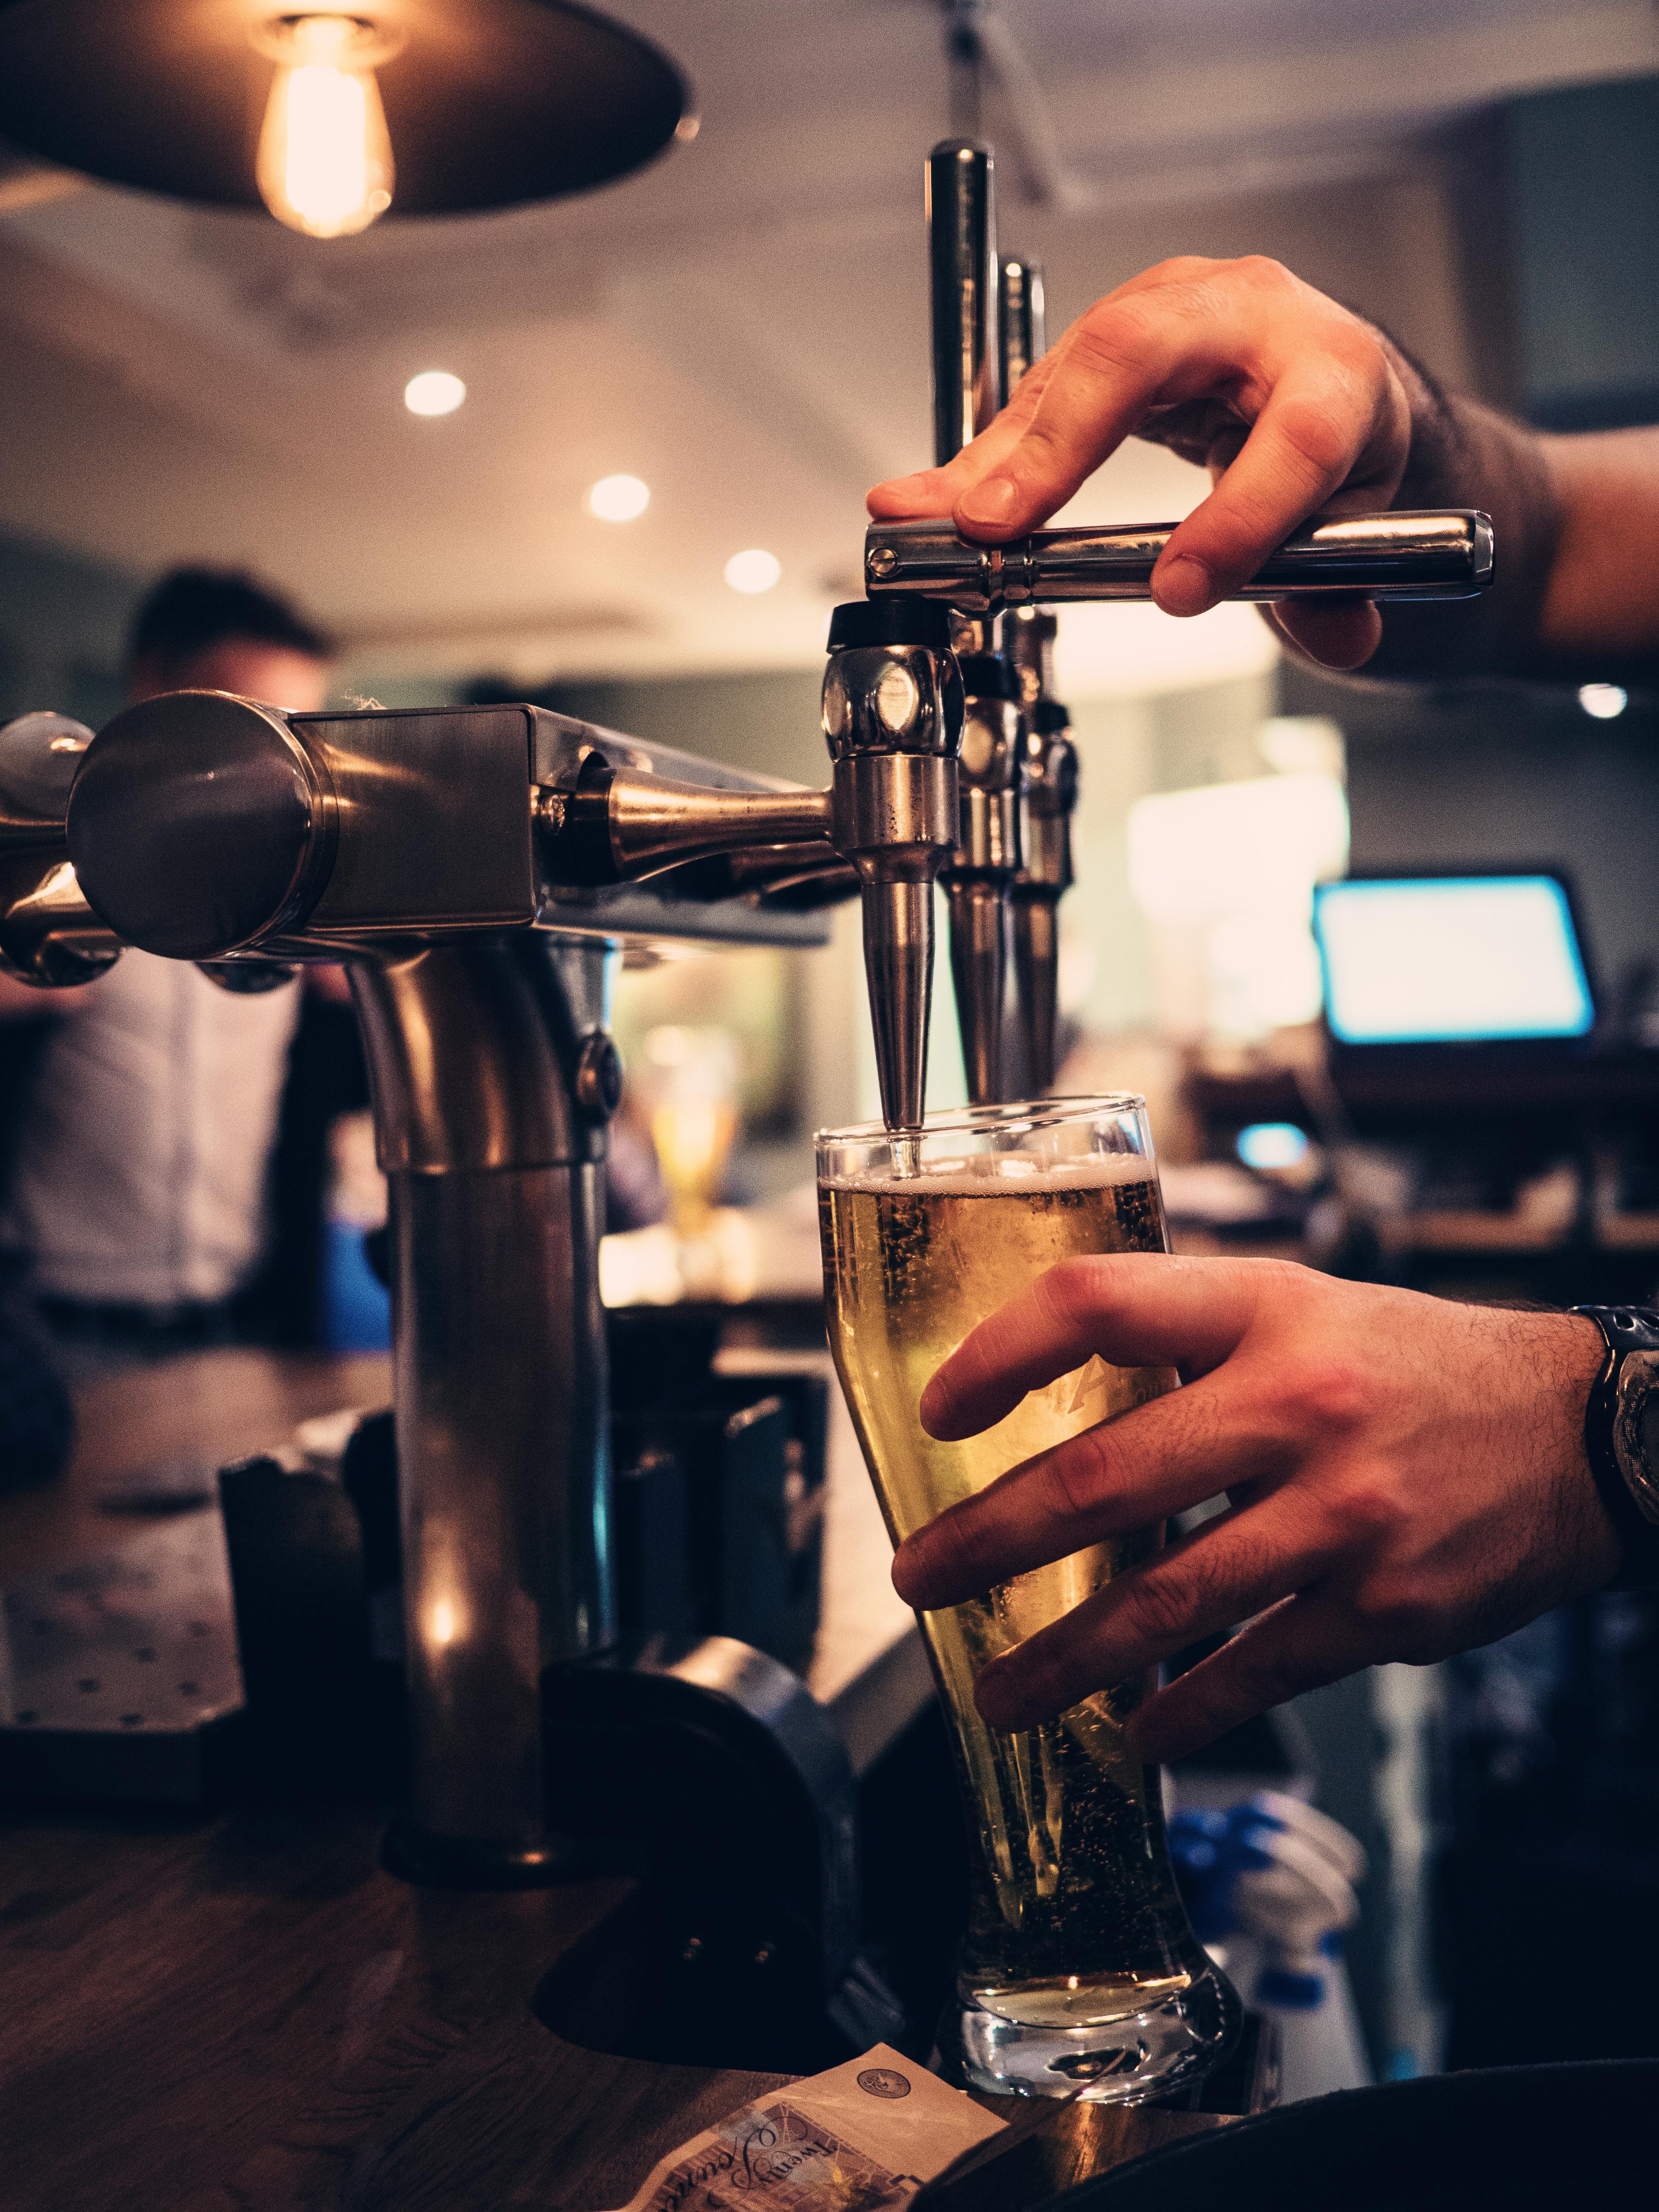 Blue Jo's Beer Pour